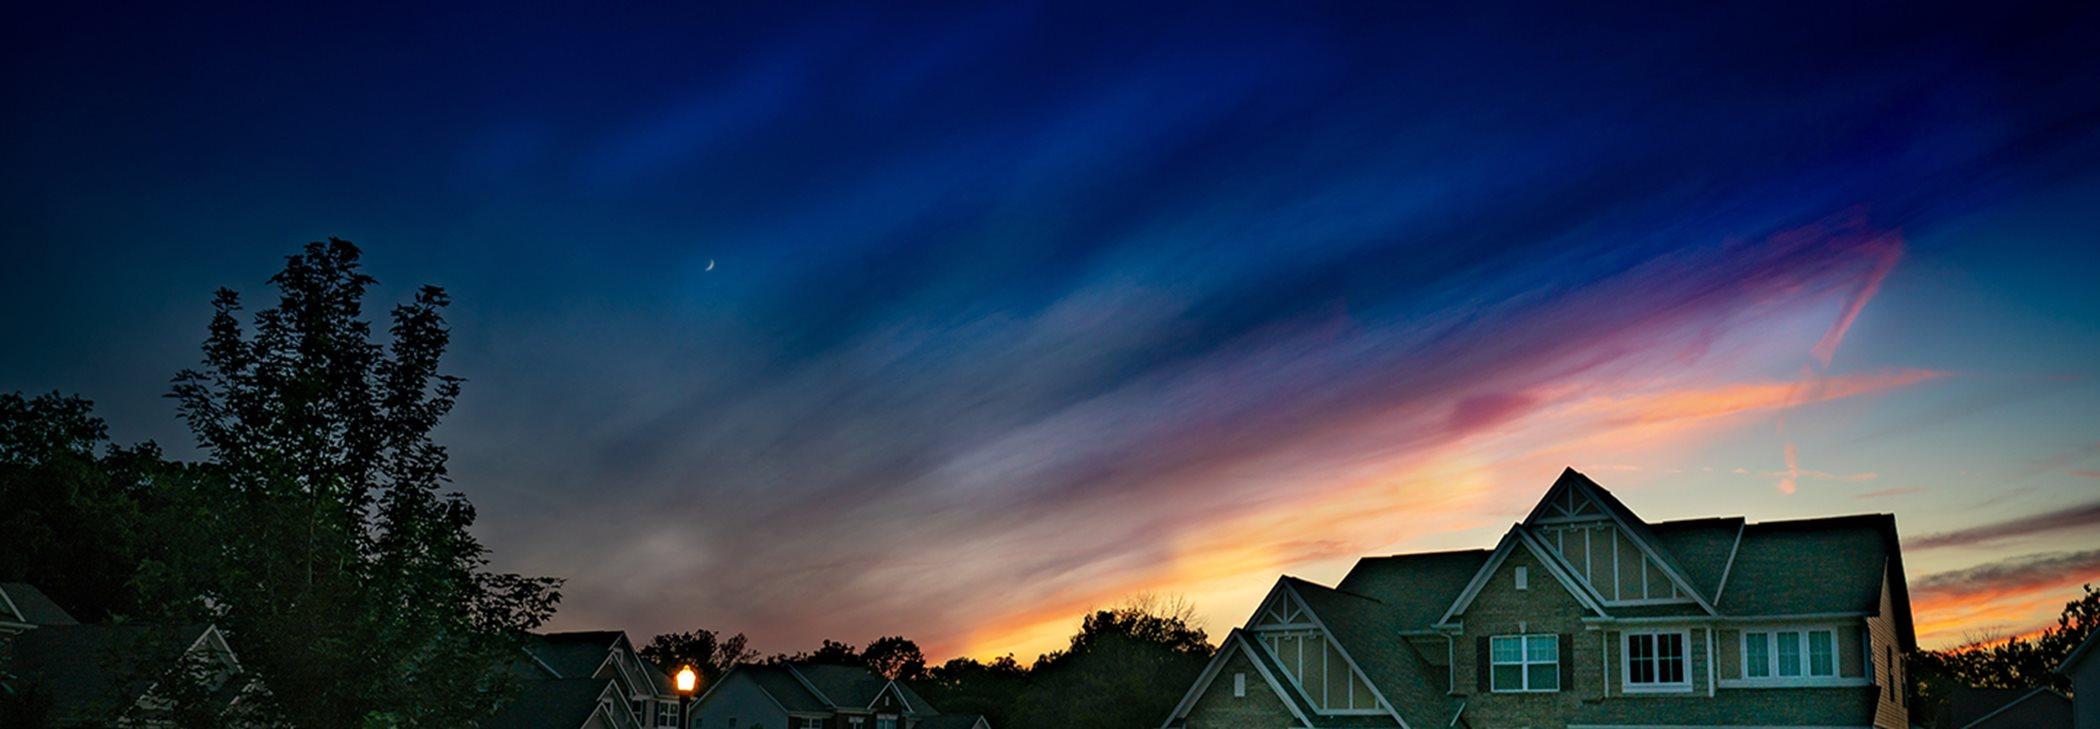 A Lennar Home at Sunset